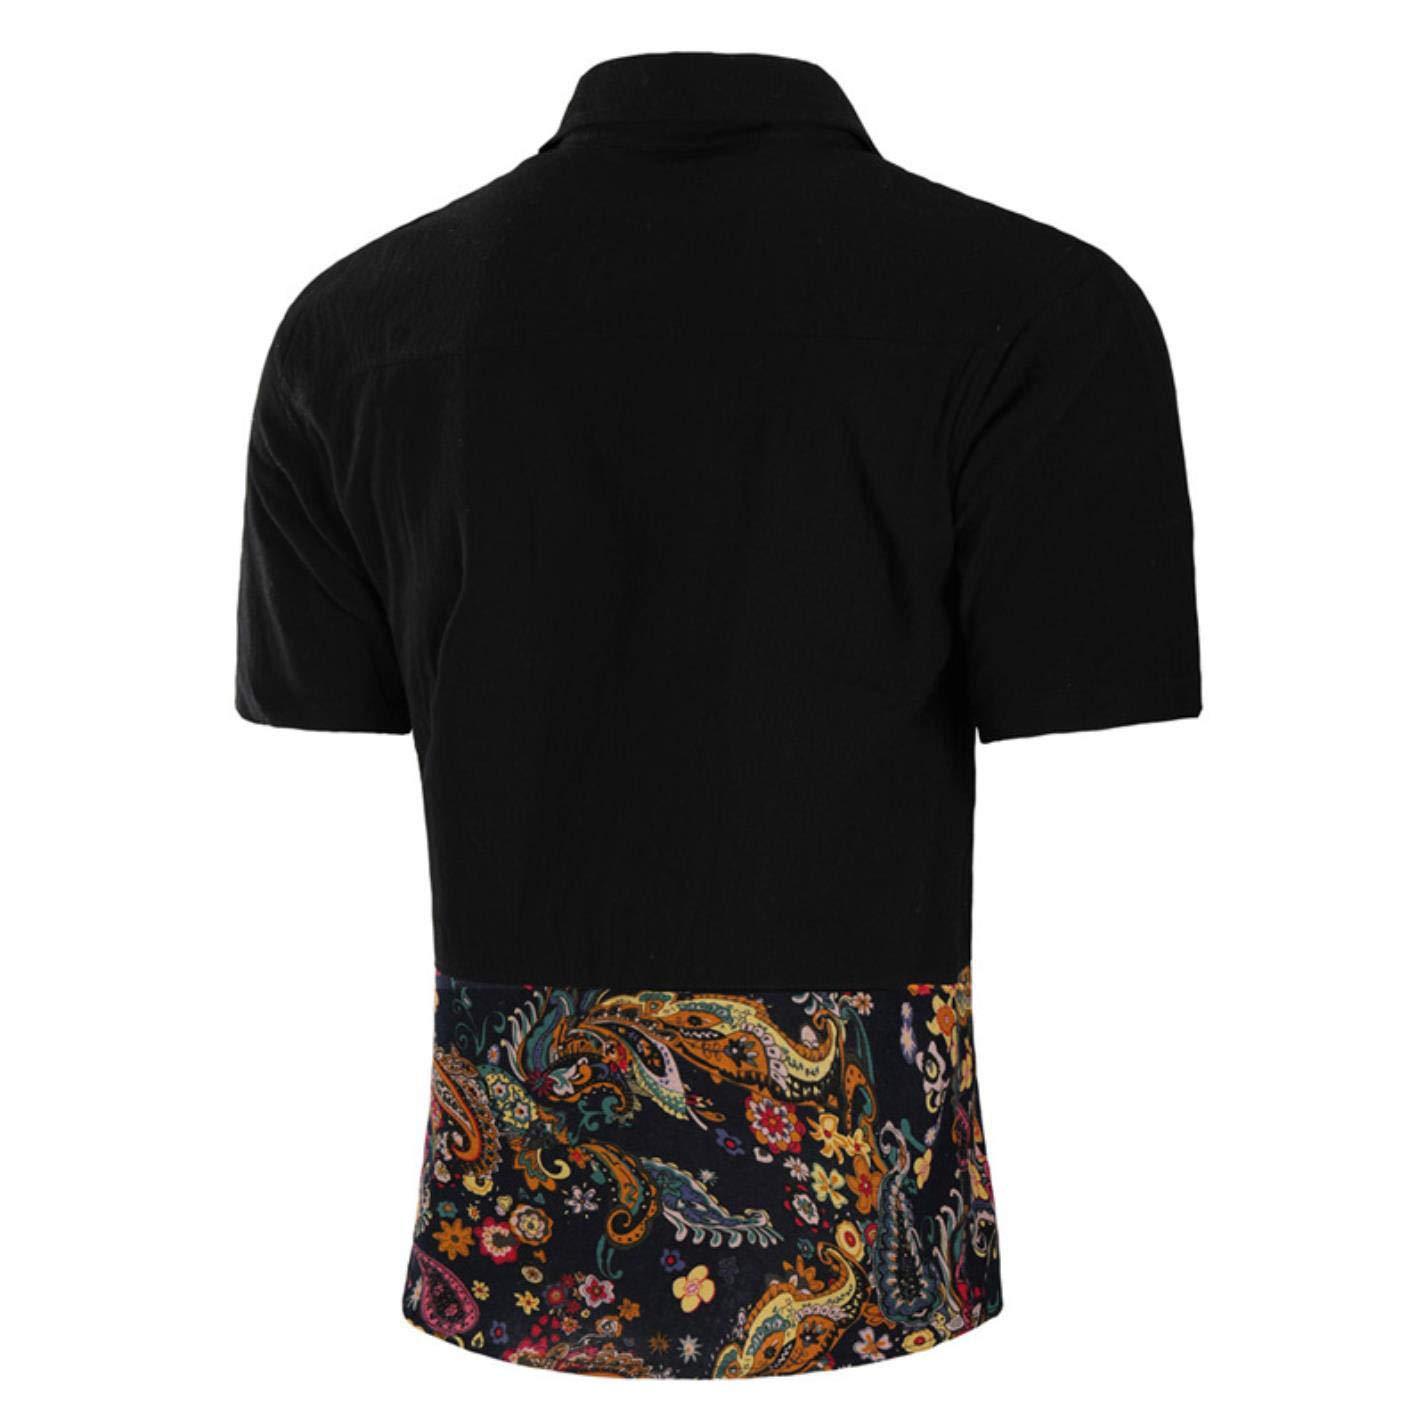 NCWK Mens Short Sleeve Hawaiian Shirt Paisley Print Casual Dress Shirts Slim Fit